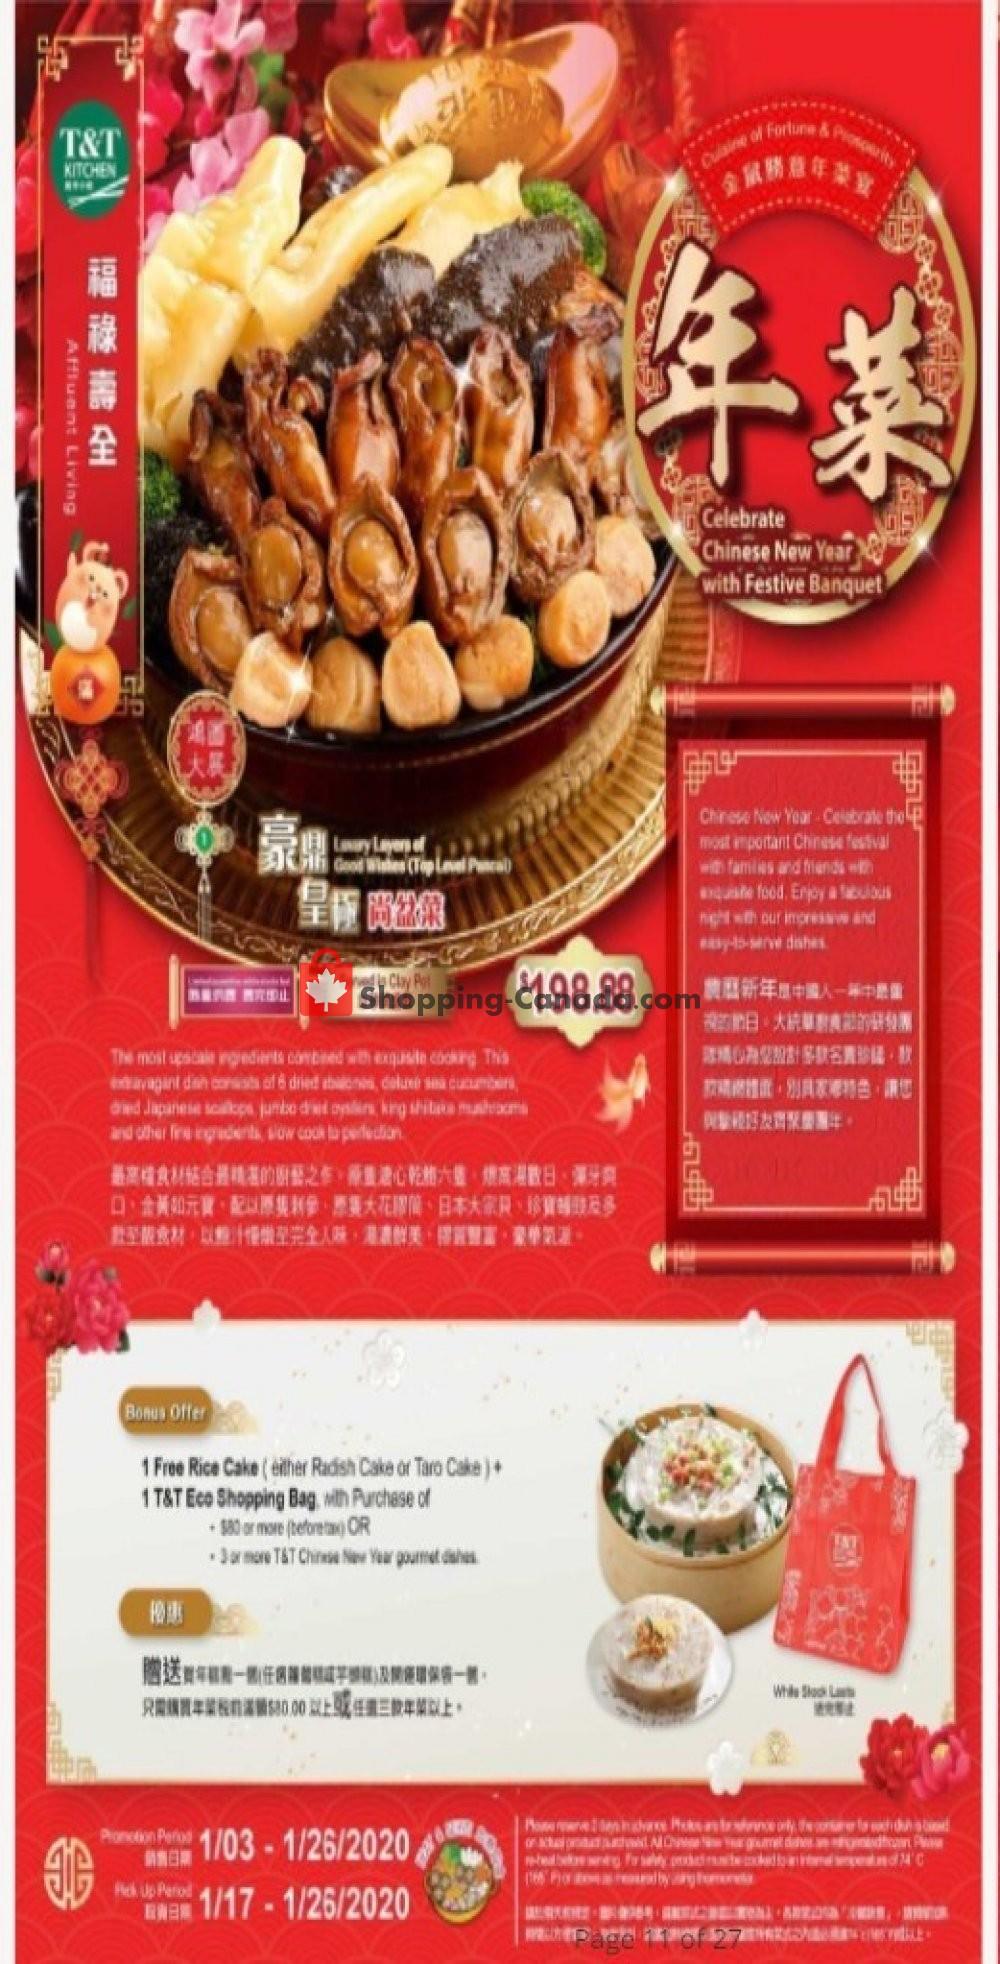 Flyer T&T Supermarket Canada - from Friday January 3, 2020 to Saturday January 25, 2020